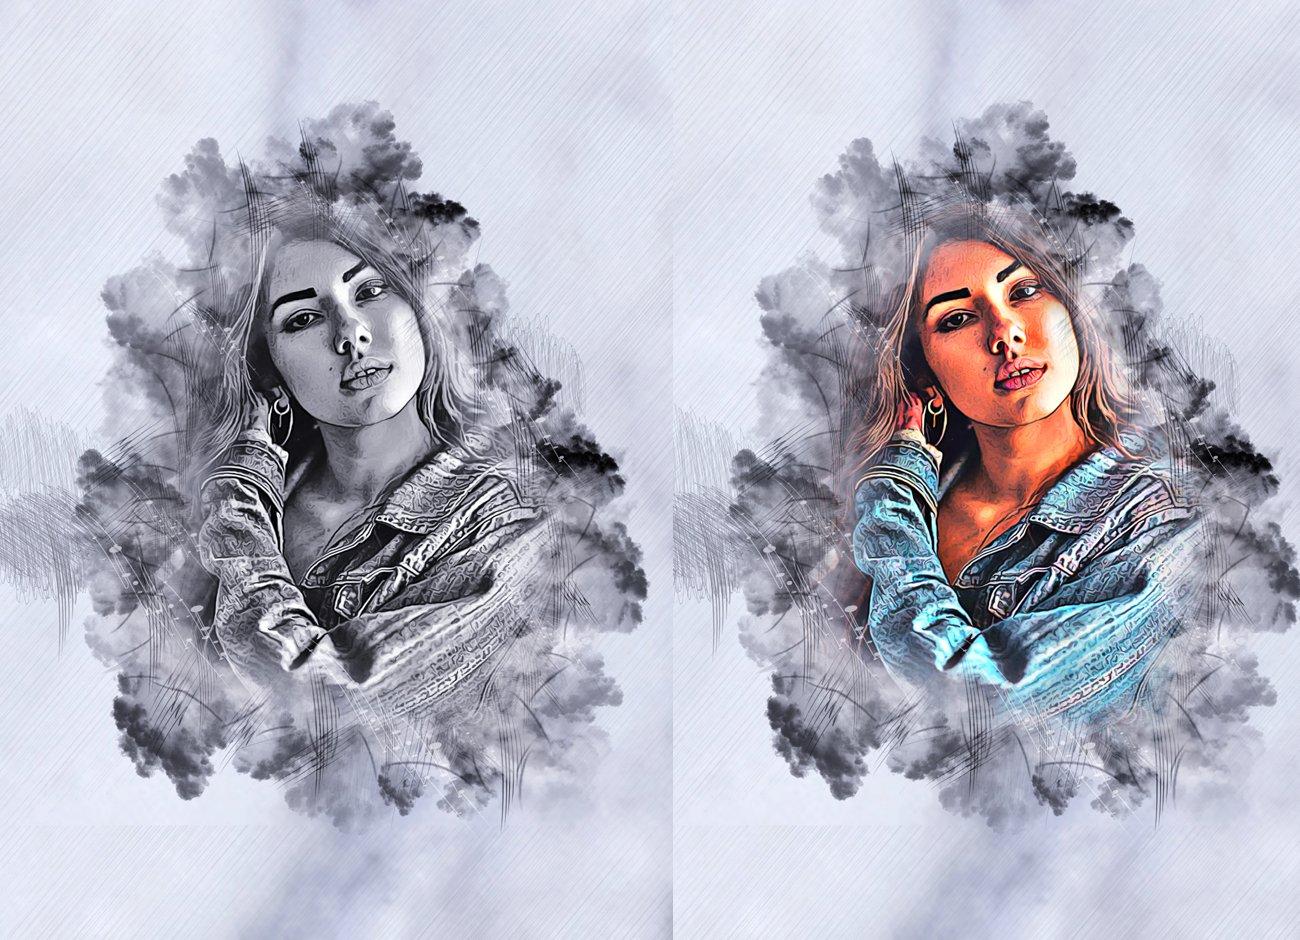 水墨素描效果照片处理特效PS动作模板 Ink Sketch Art Photoshop Action插图1